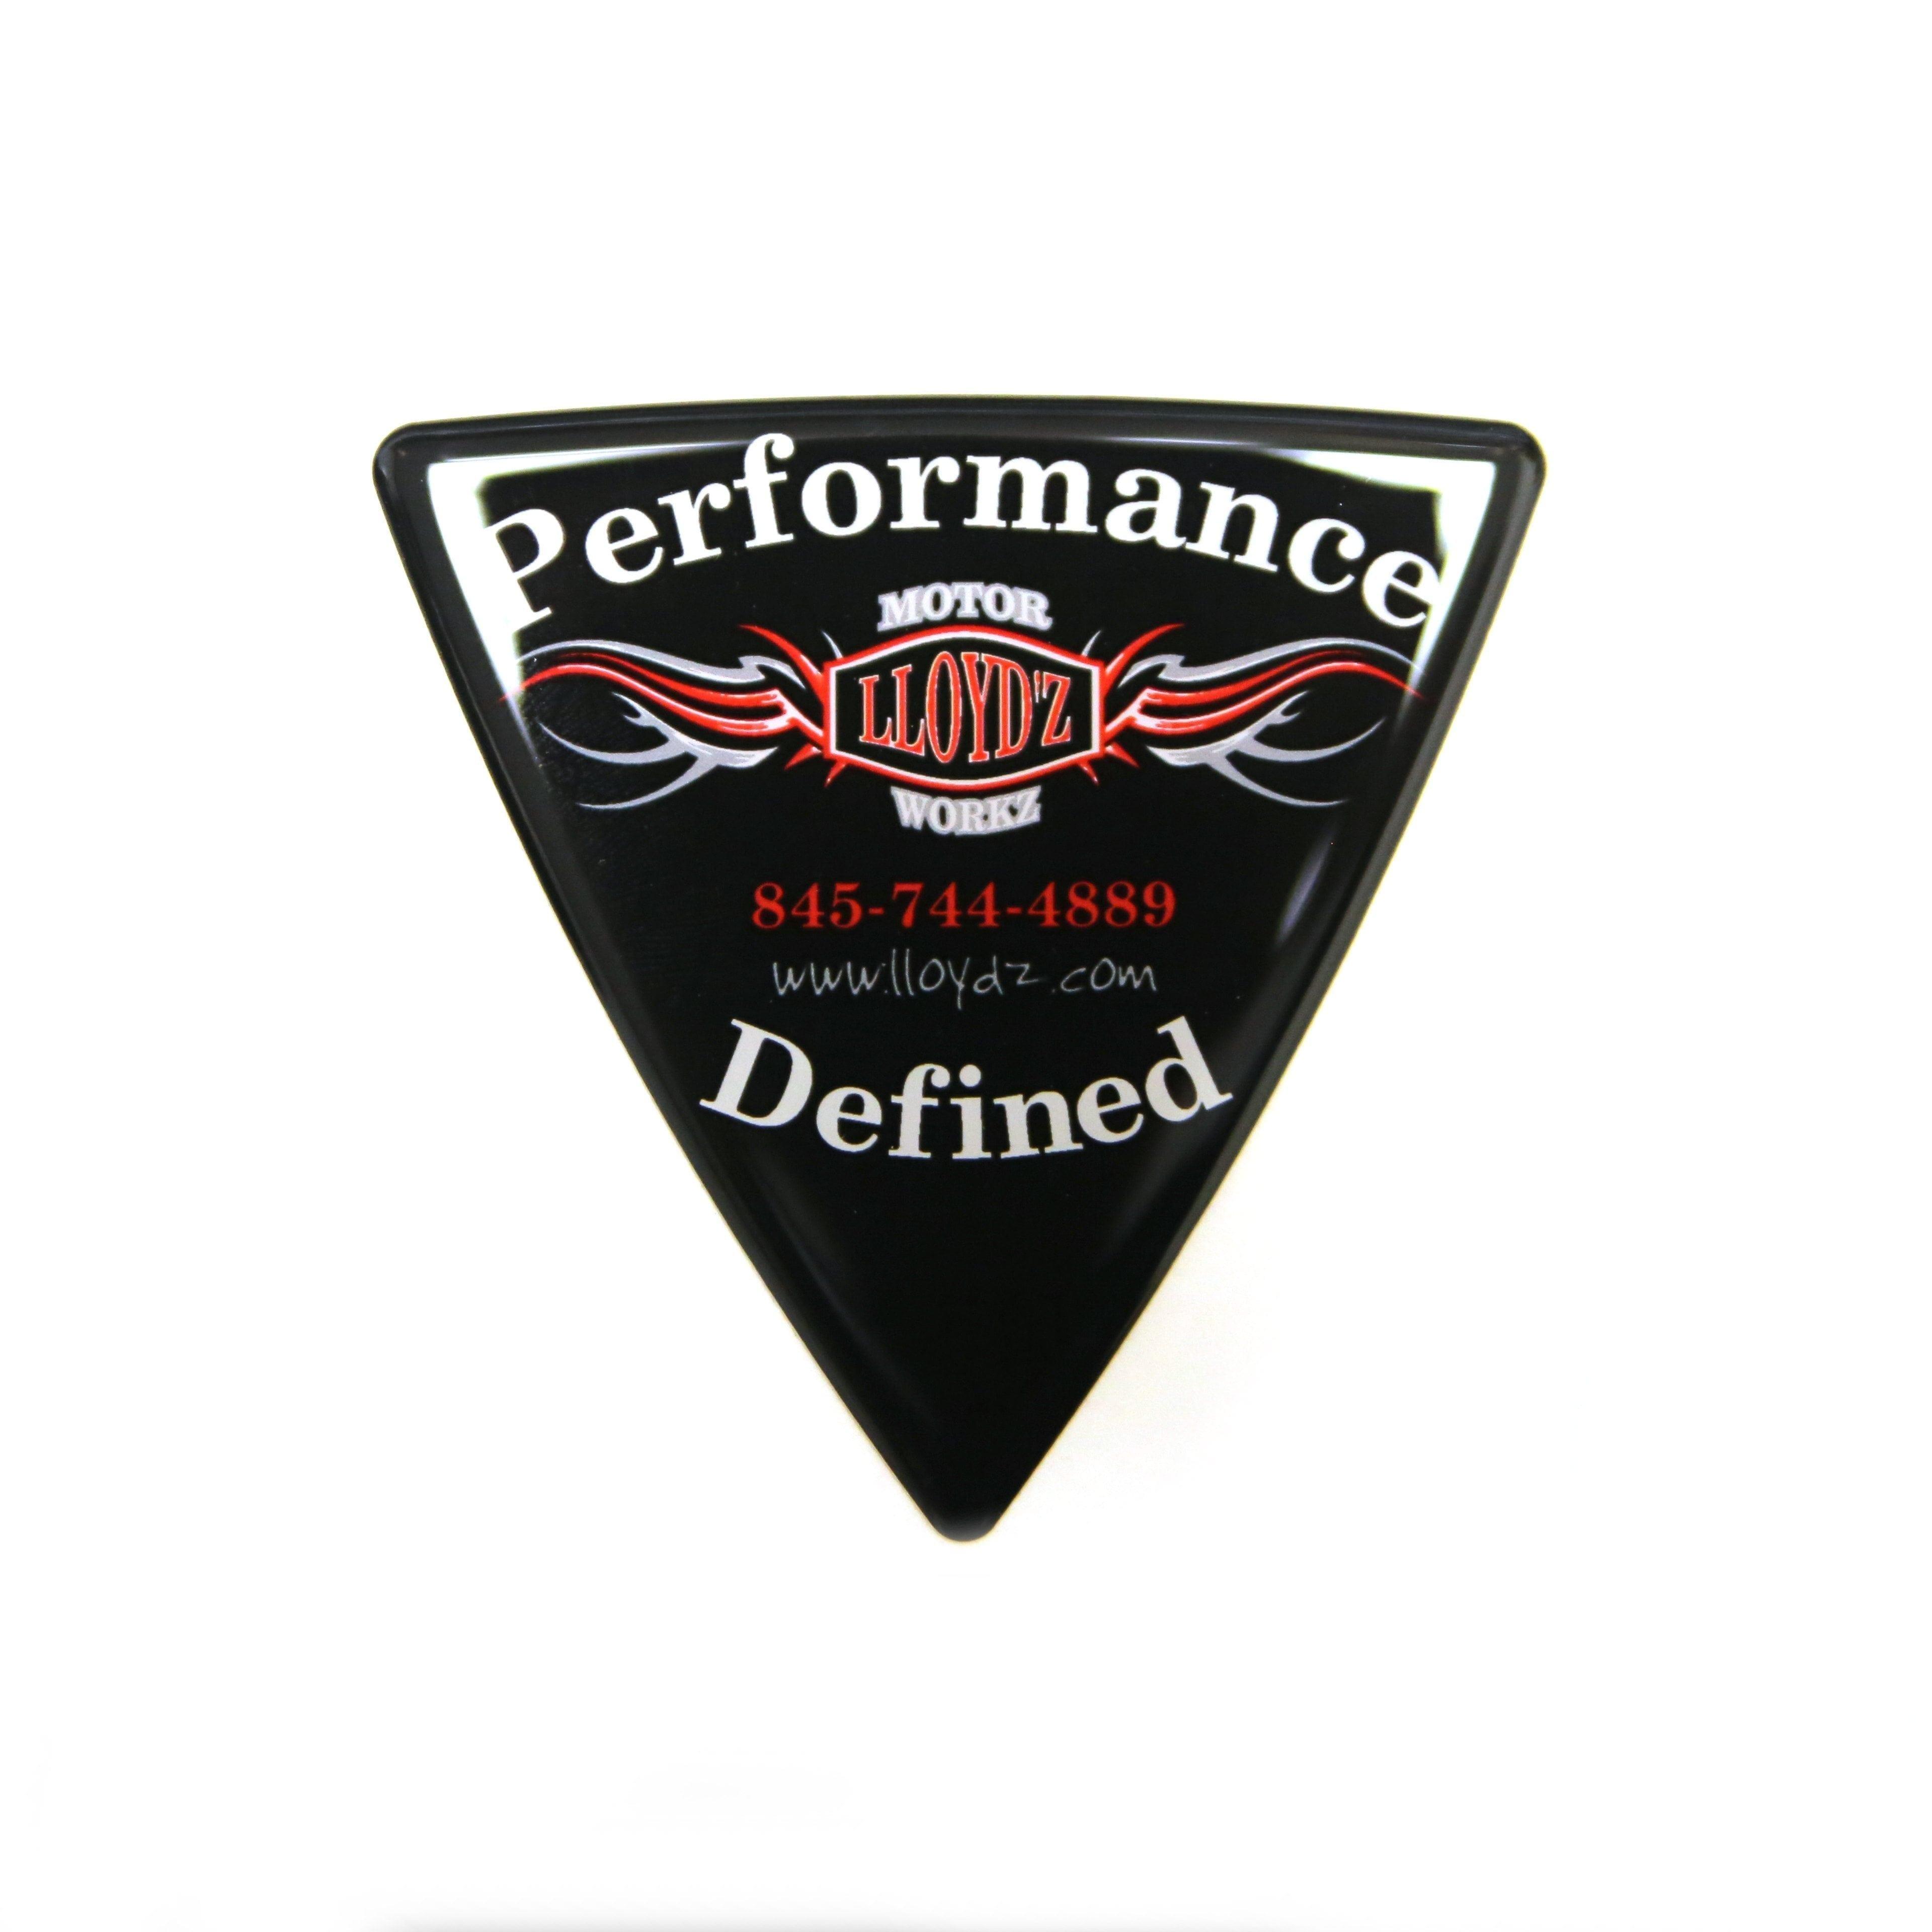 LLOYD'Z Wedge Badge